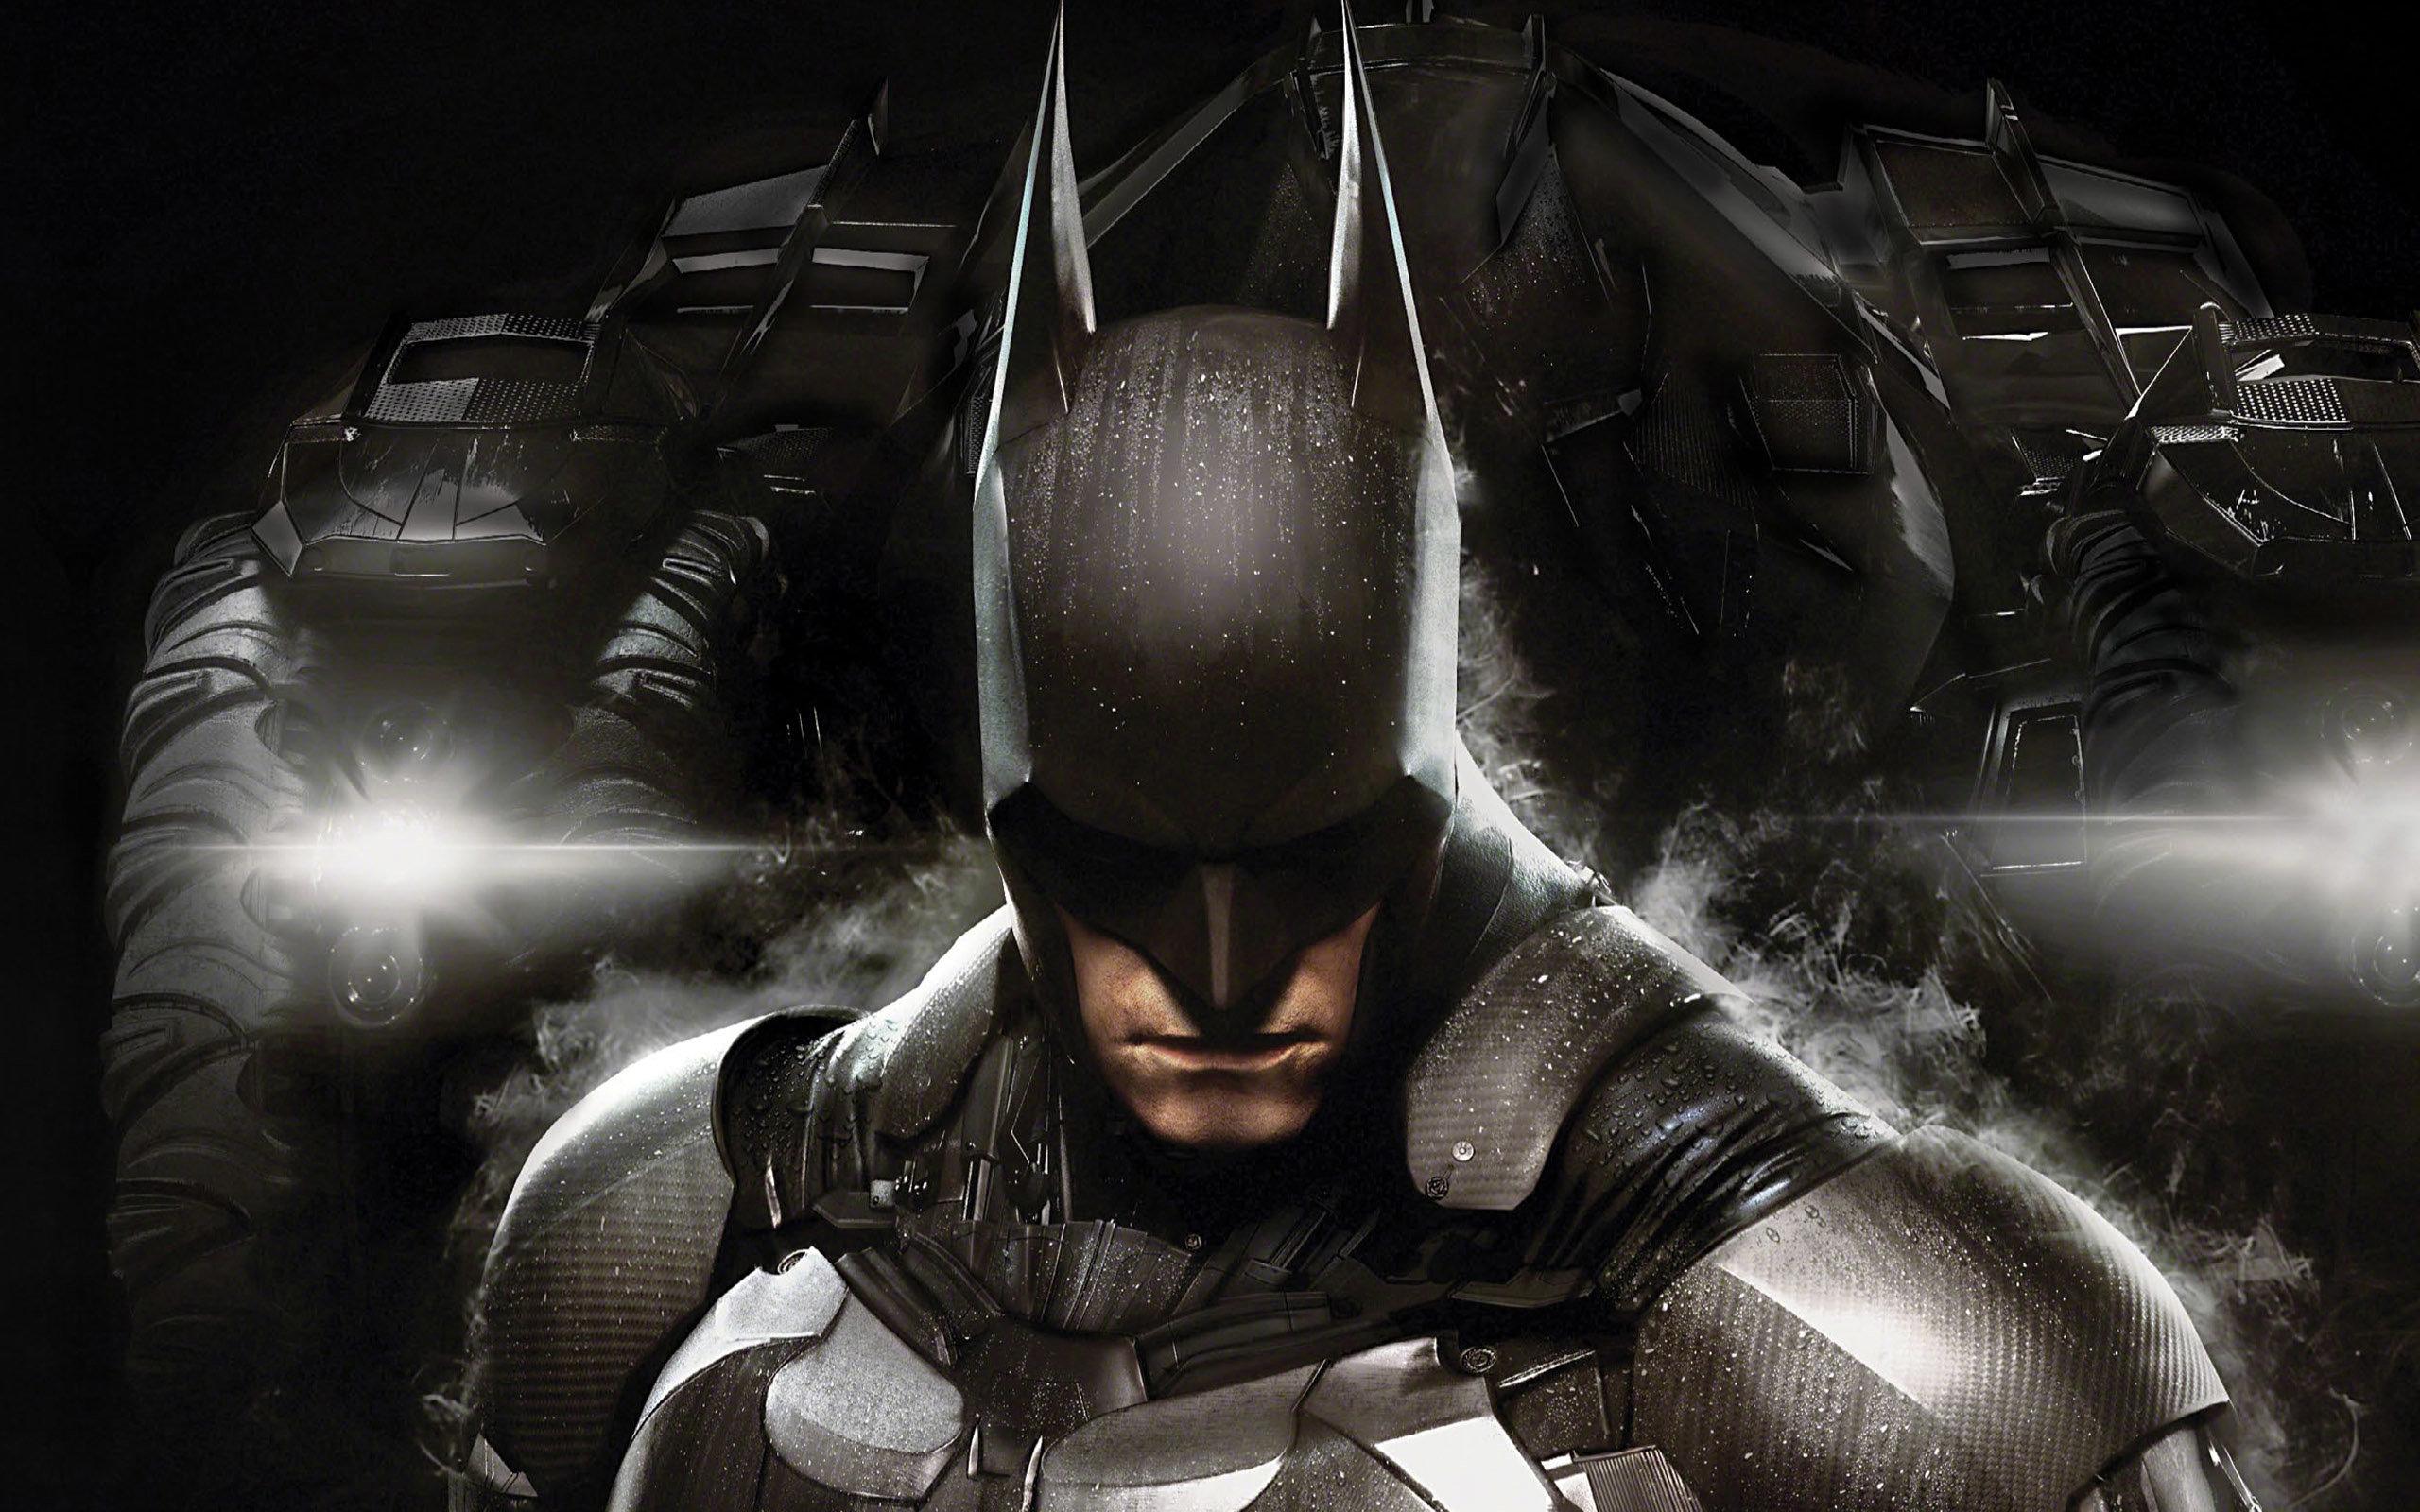 Batman Arkham Knight Wallpapers Hd For Desktop Backgrounds